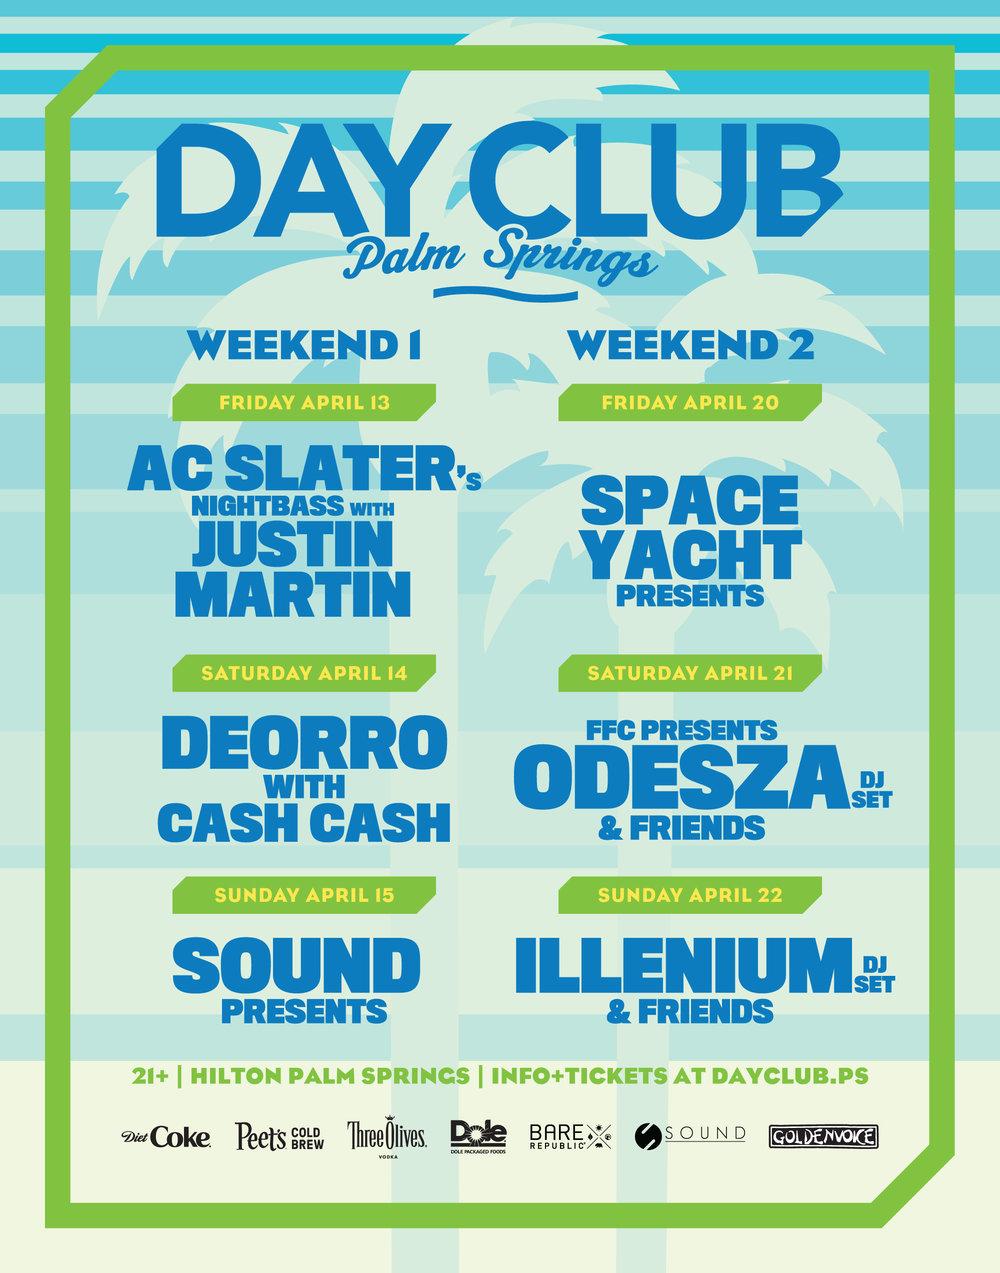 ODESZA, Illenium, Deorro & More to Headline Day Club Parties During Coachella